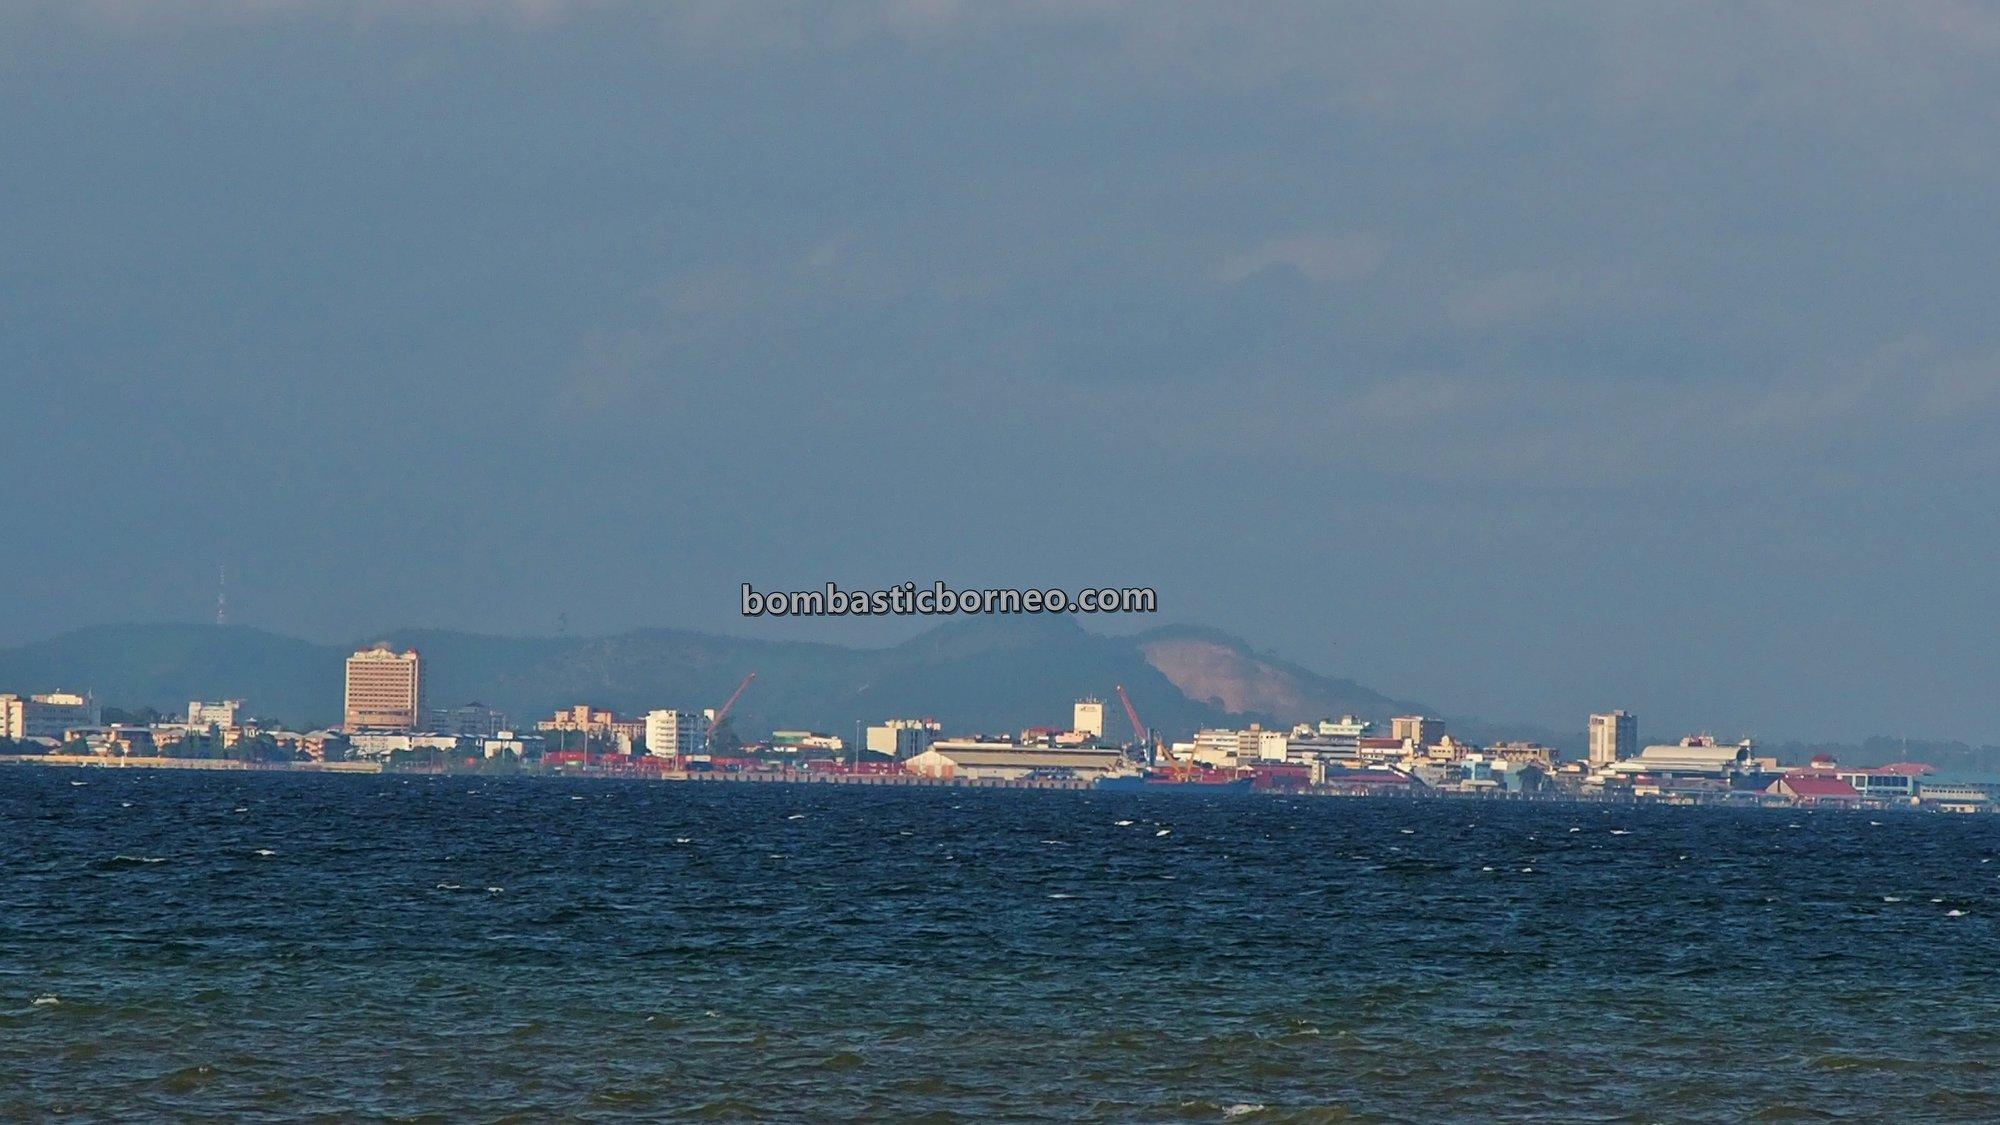 Pulau Sebatik, backpackers, exploration, jelajah, jetty, Kampung Melayu, Tawau, Malaysia, Sabah, Bergosong, Tourism, tourist attraction, Travel Guide, Trans Borneo,